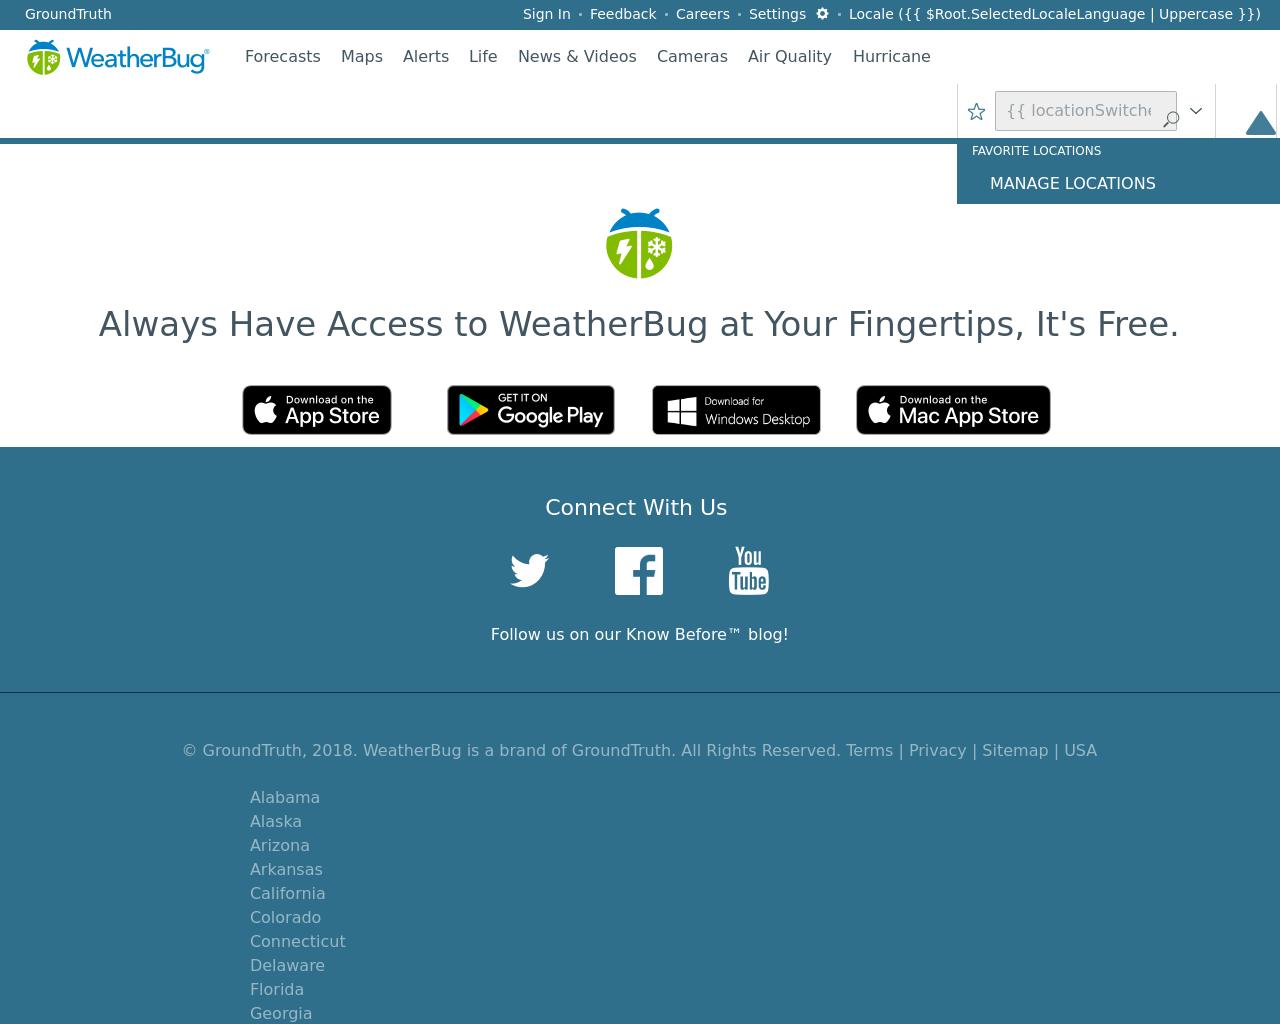 WeatherBug Advertising Mediakits, Reviews, Pricing, Traffic